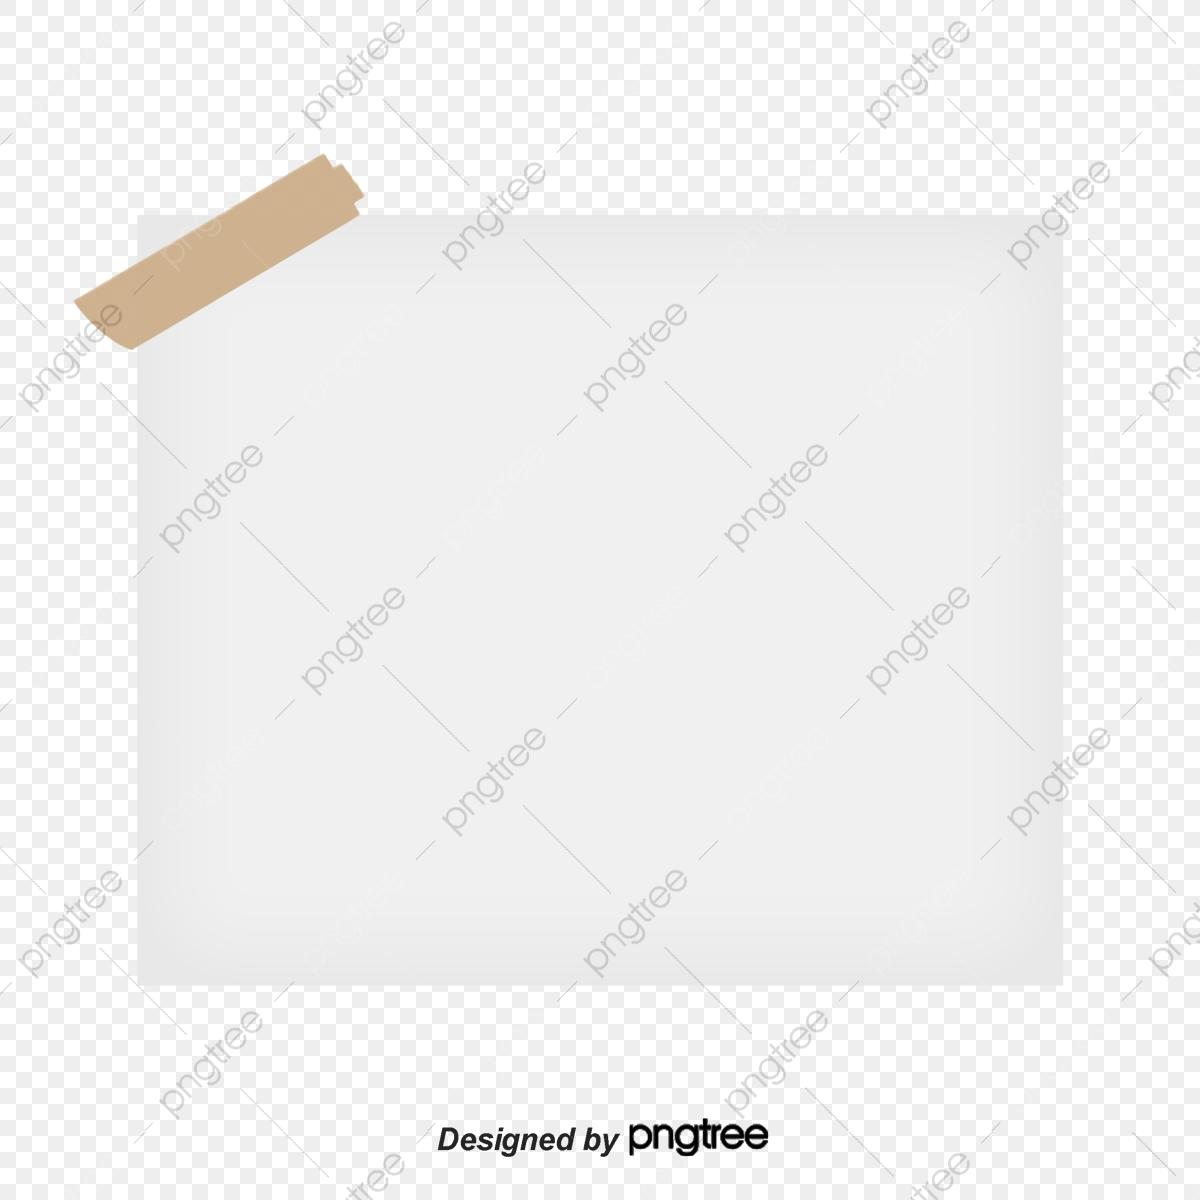 Paper Notes, Color Notes, Notes PNG Transparent Clipart.